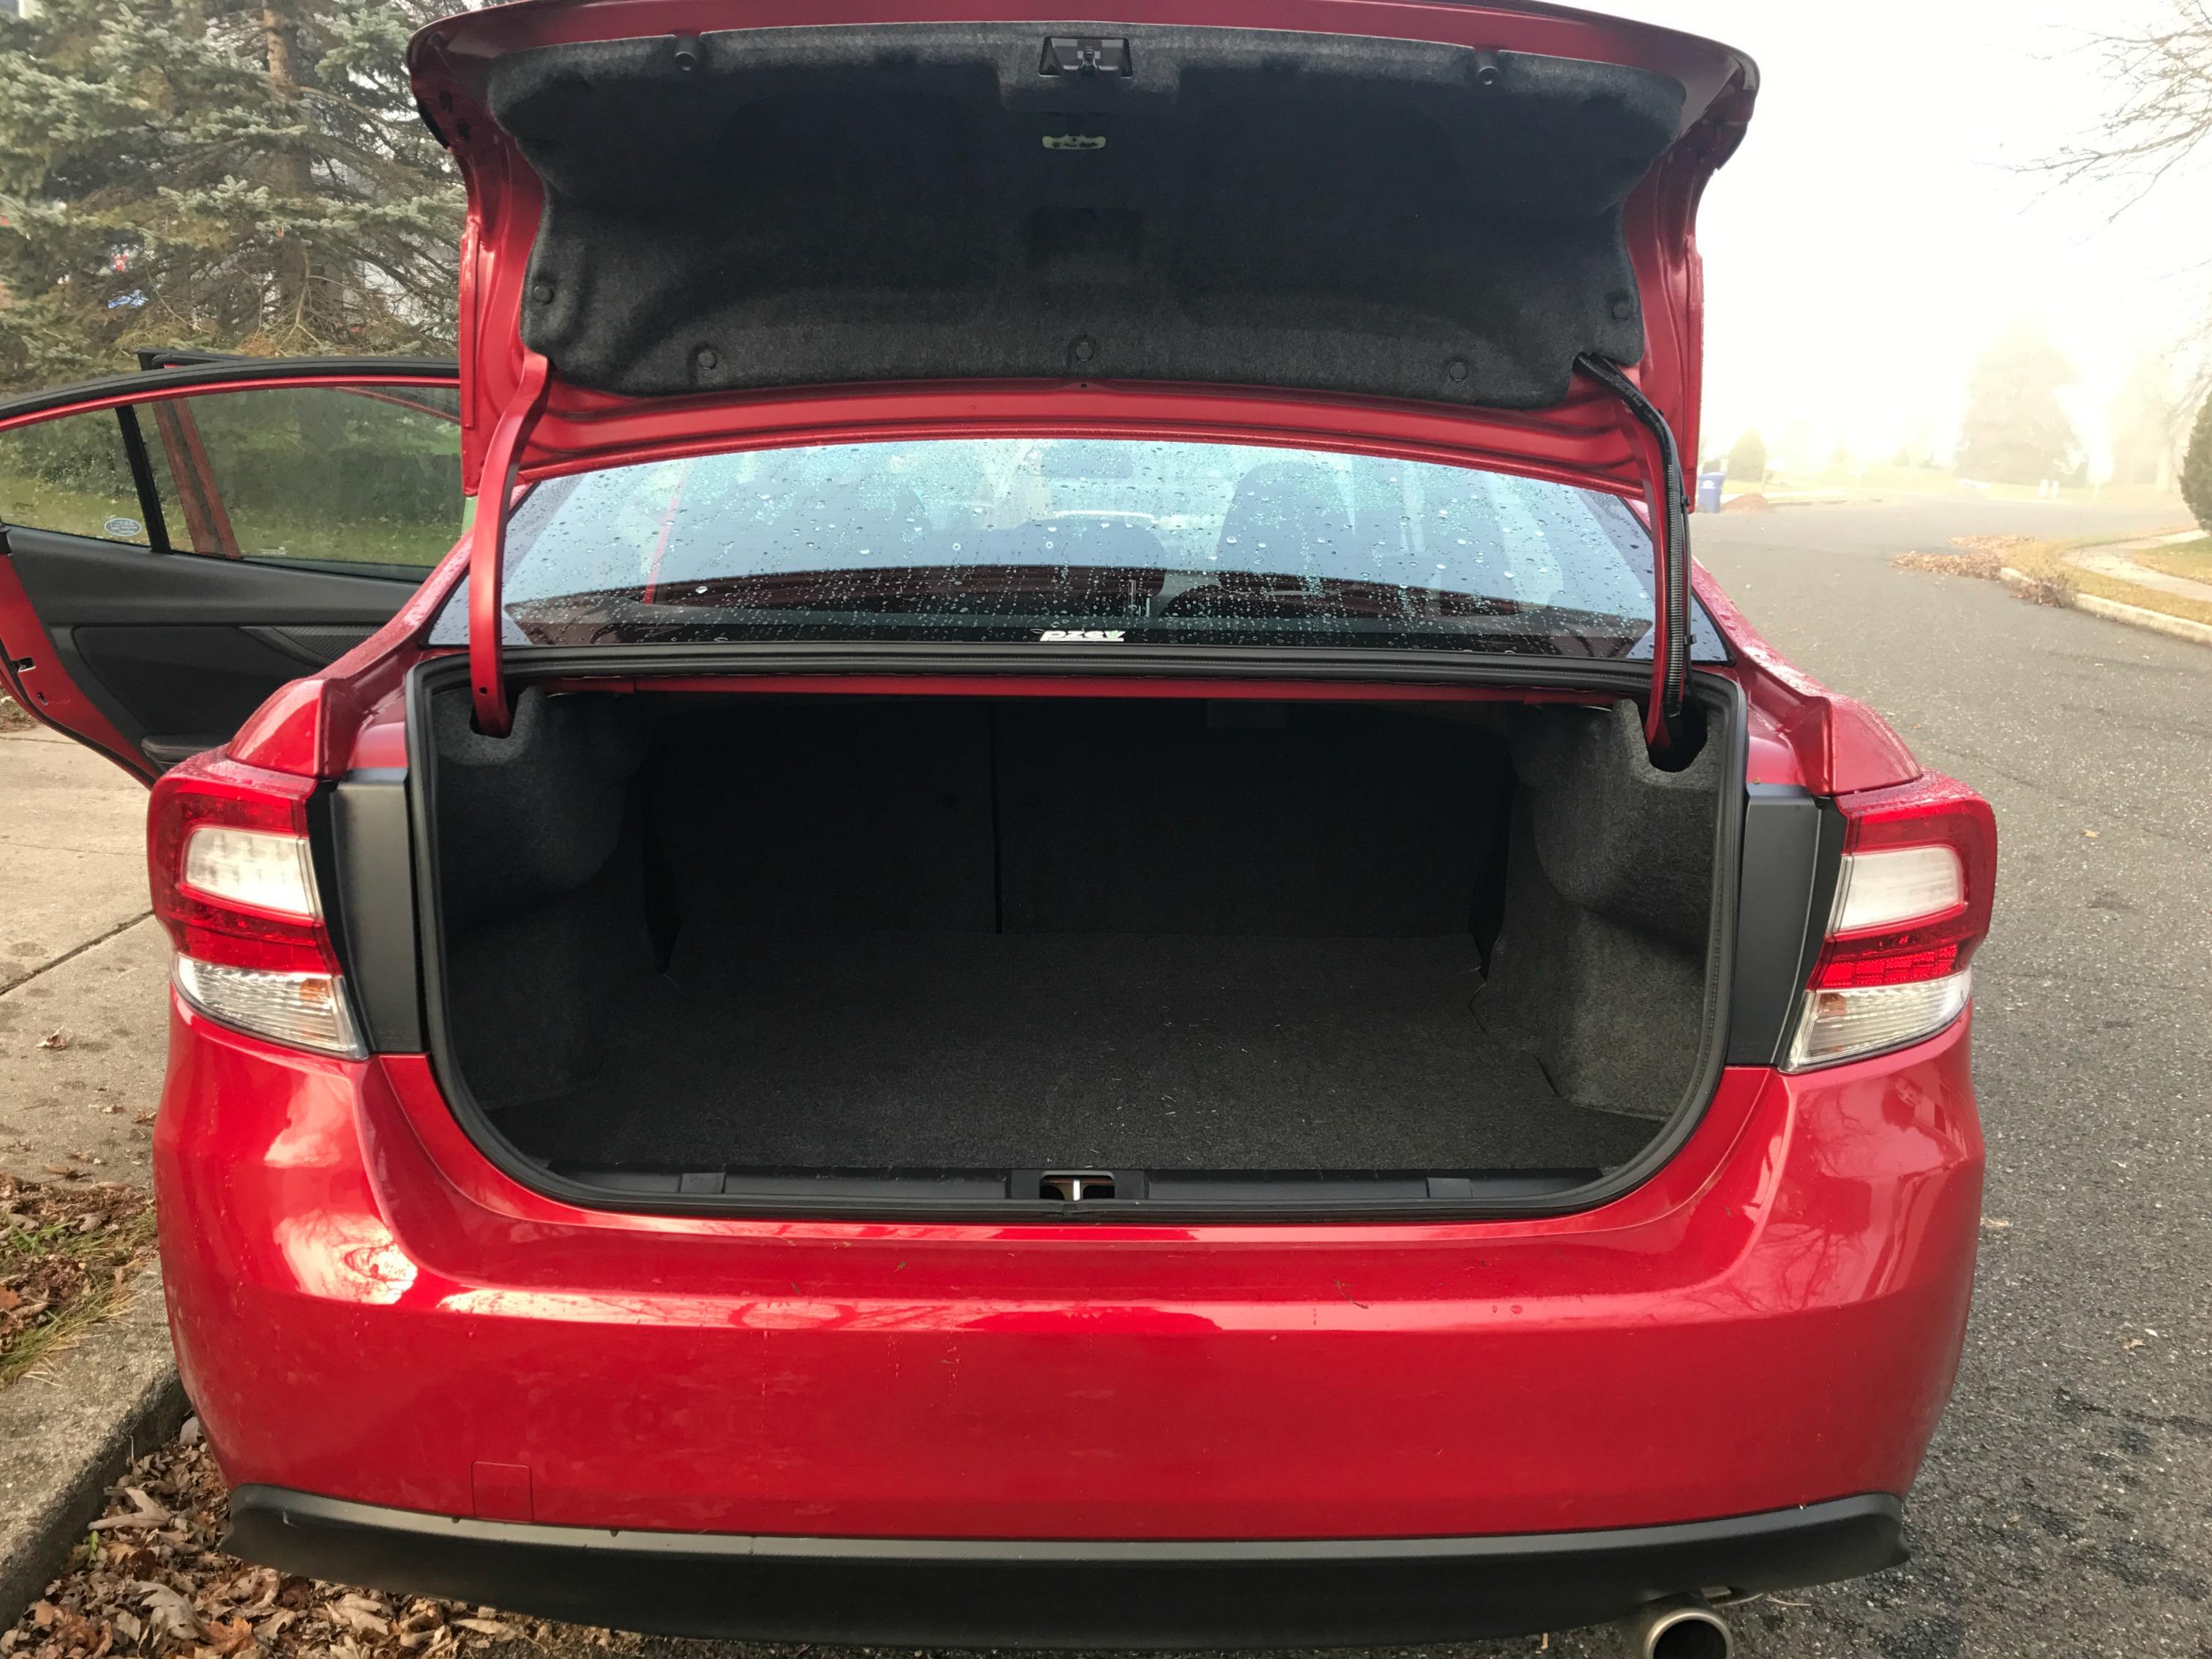 2017 Subaru Impreza trunk space